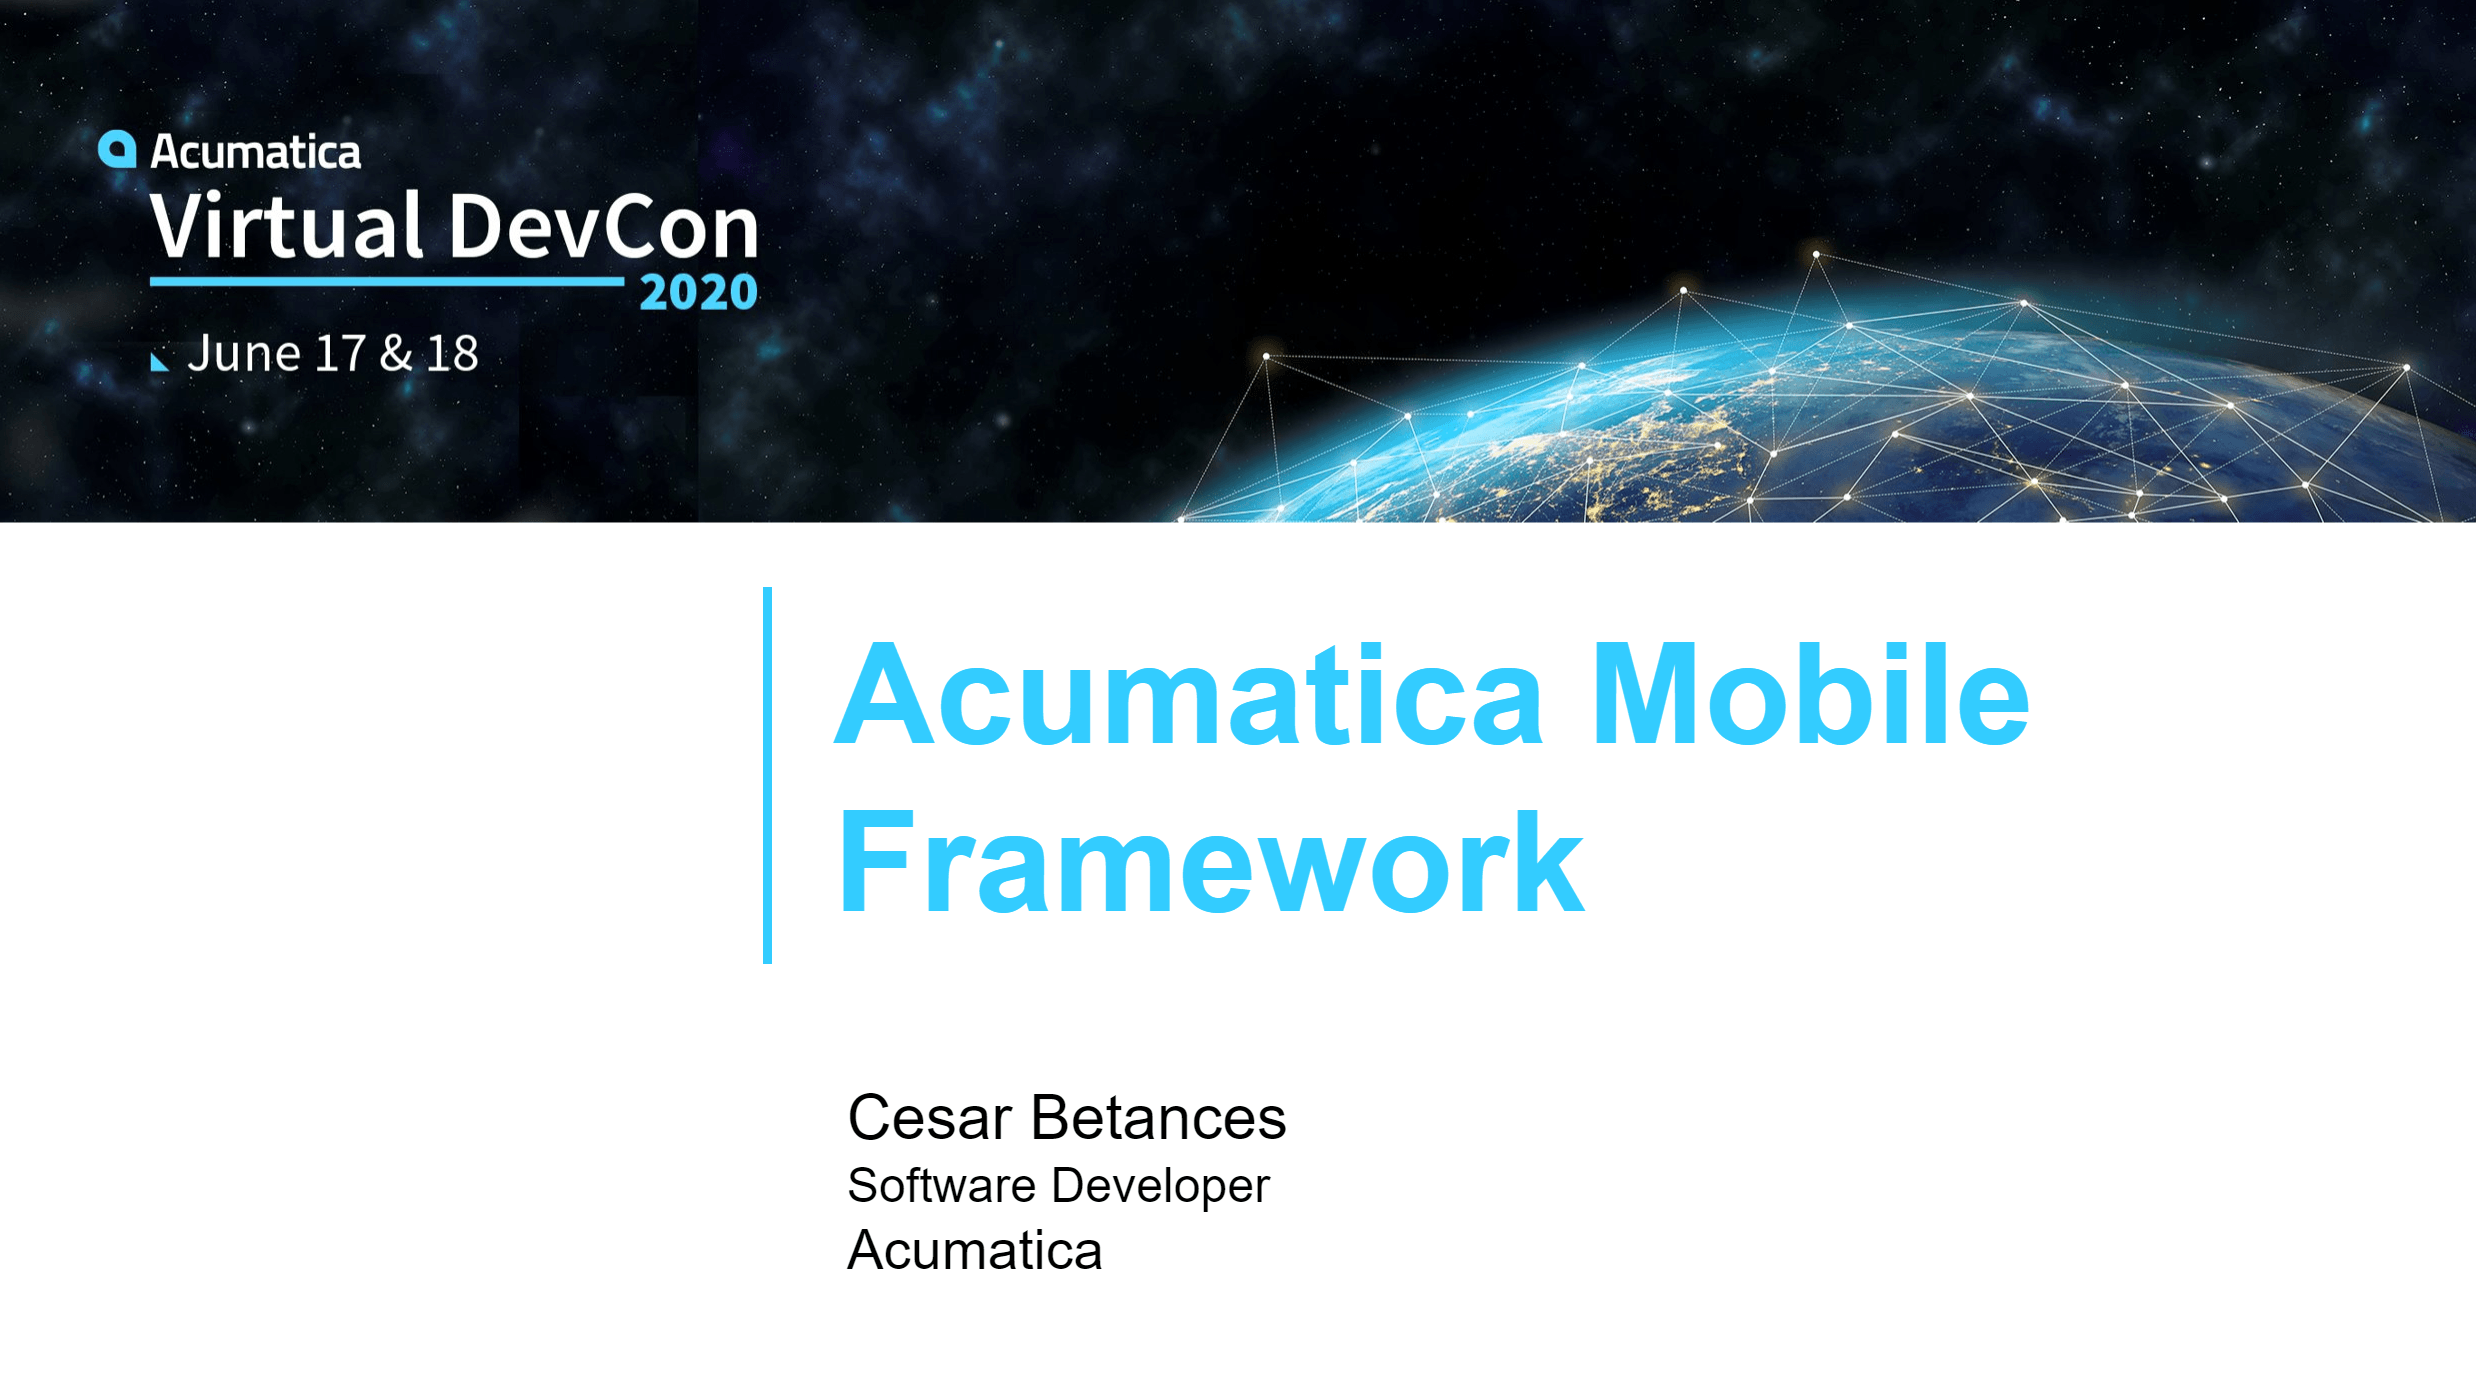 DevCon 2020 - Acumatica Mobile Framework